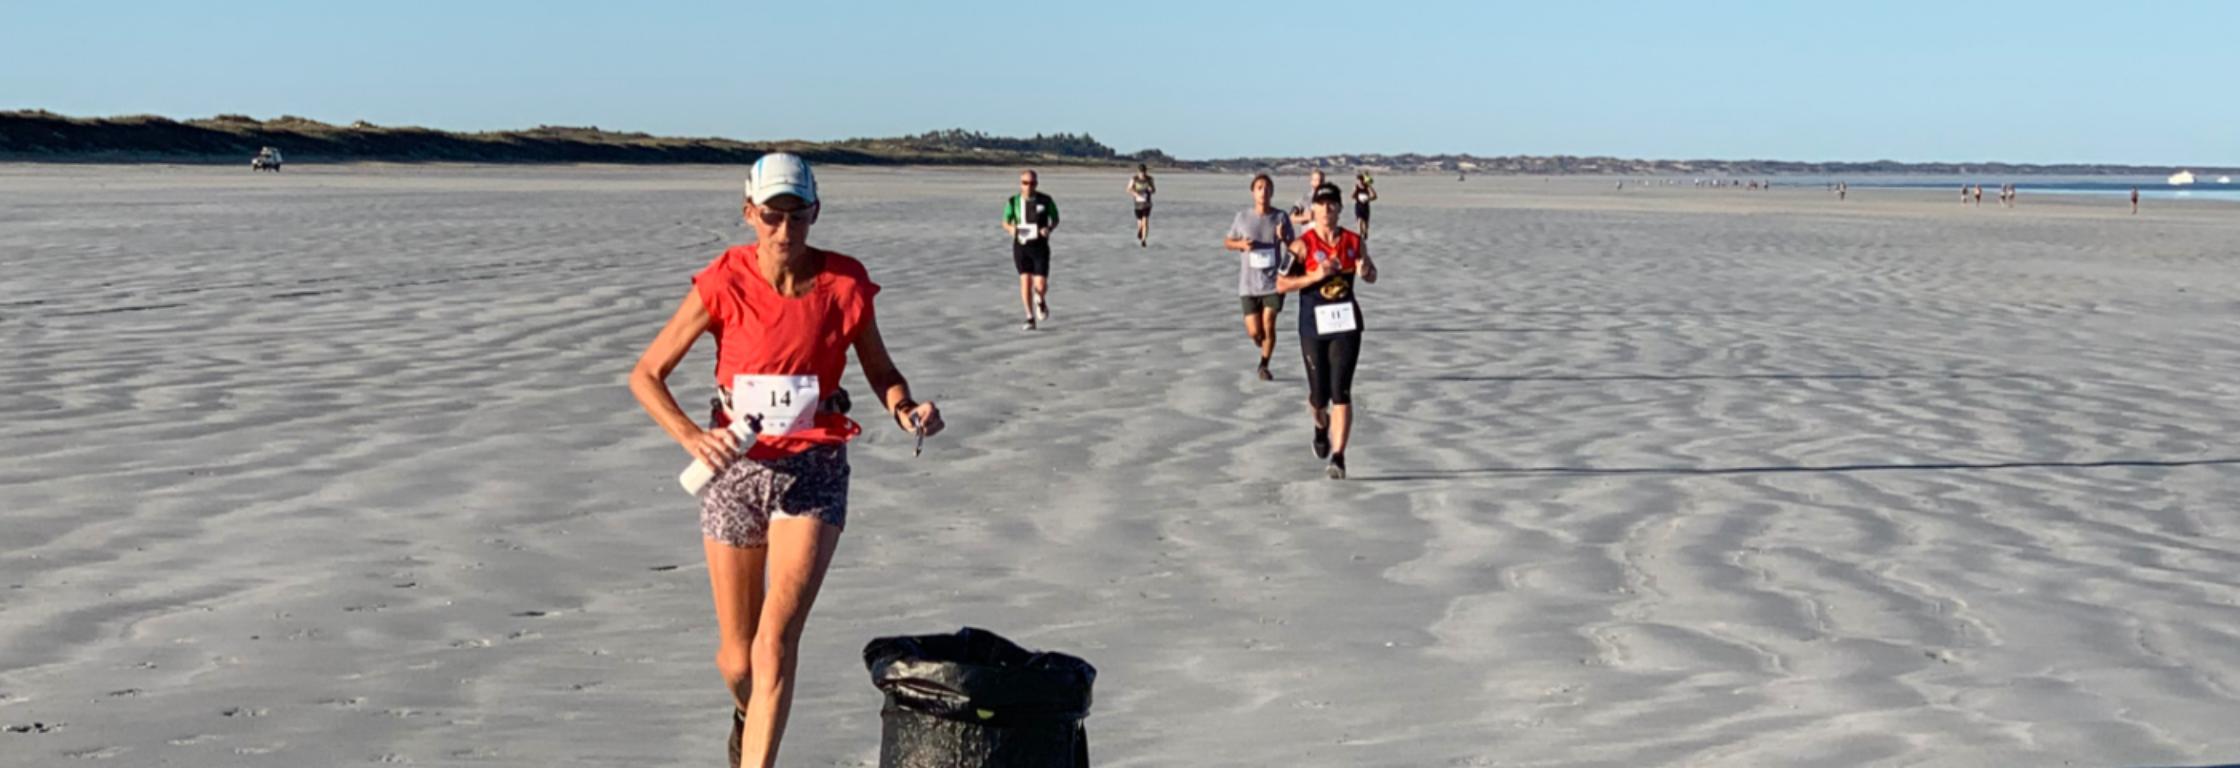 Ingrid IJsebaert liep een marathon in extreme hitte 100% over strand